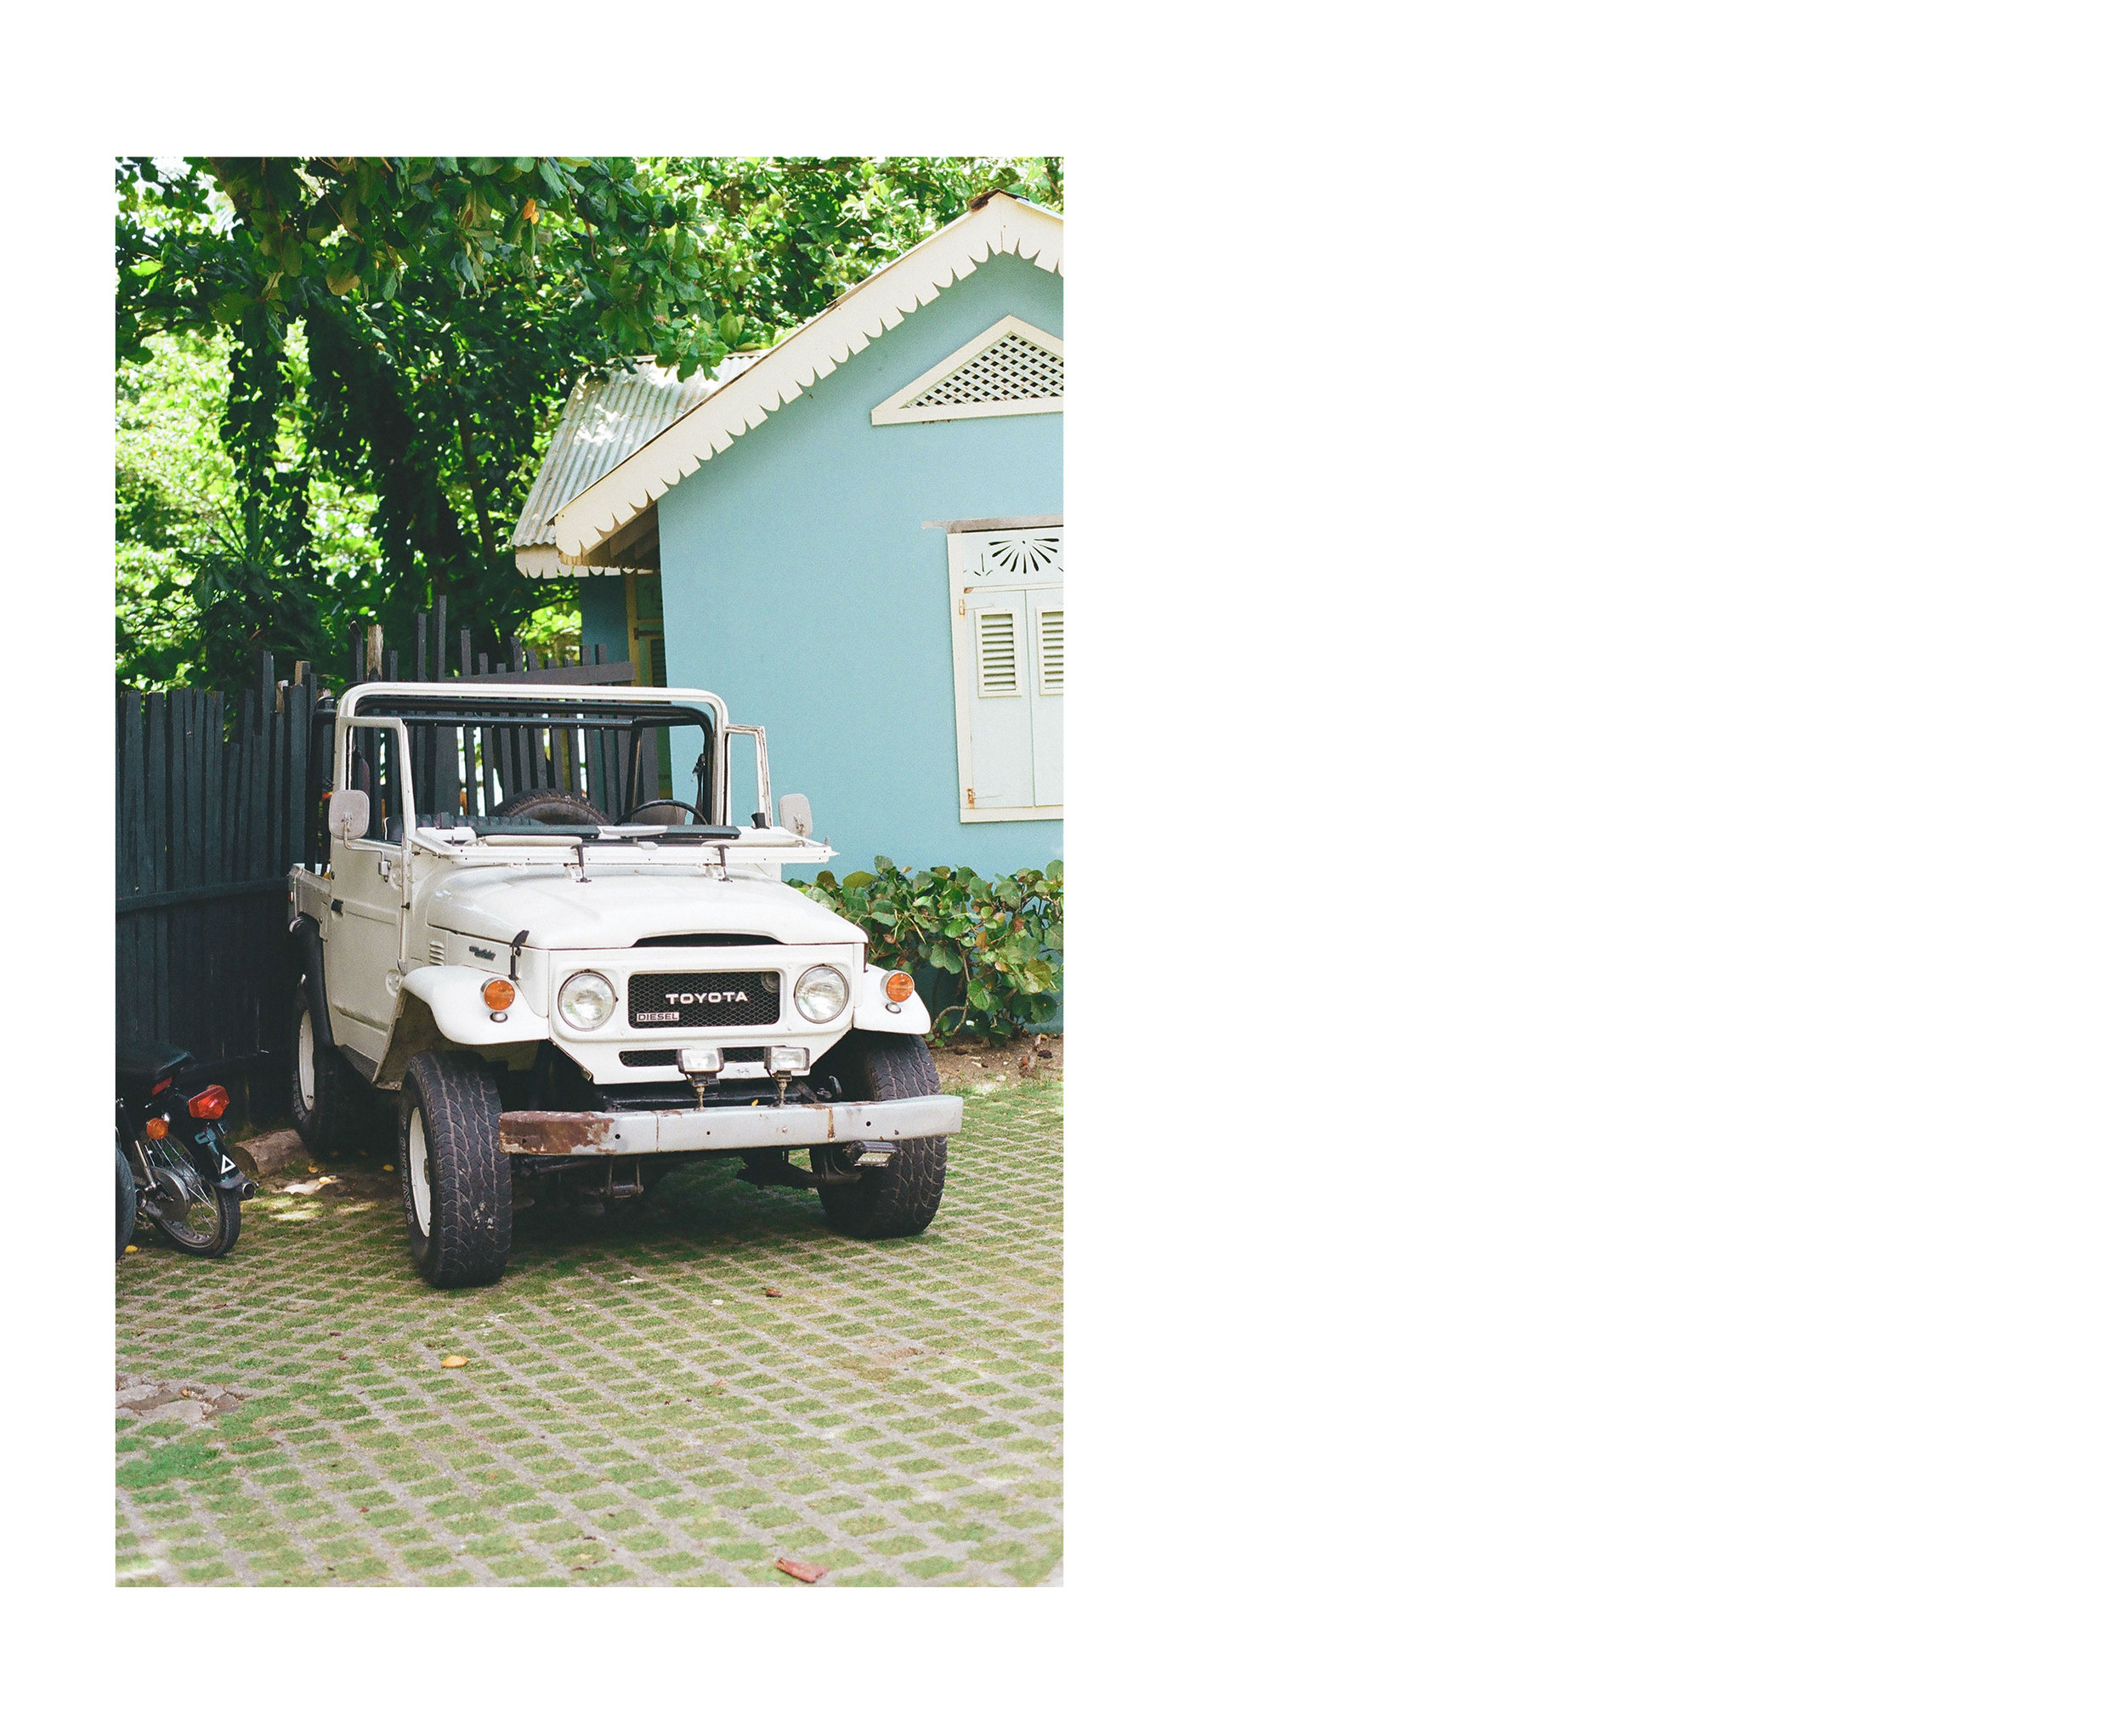 cabrera-jeep.jpg